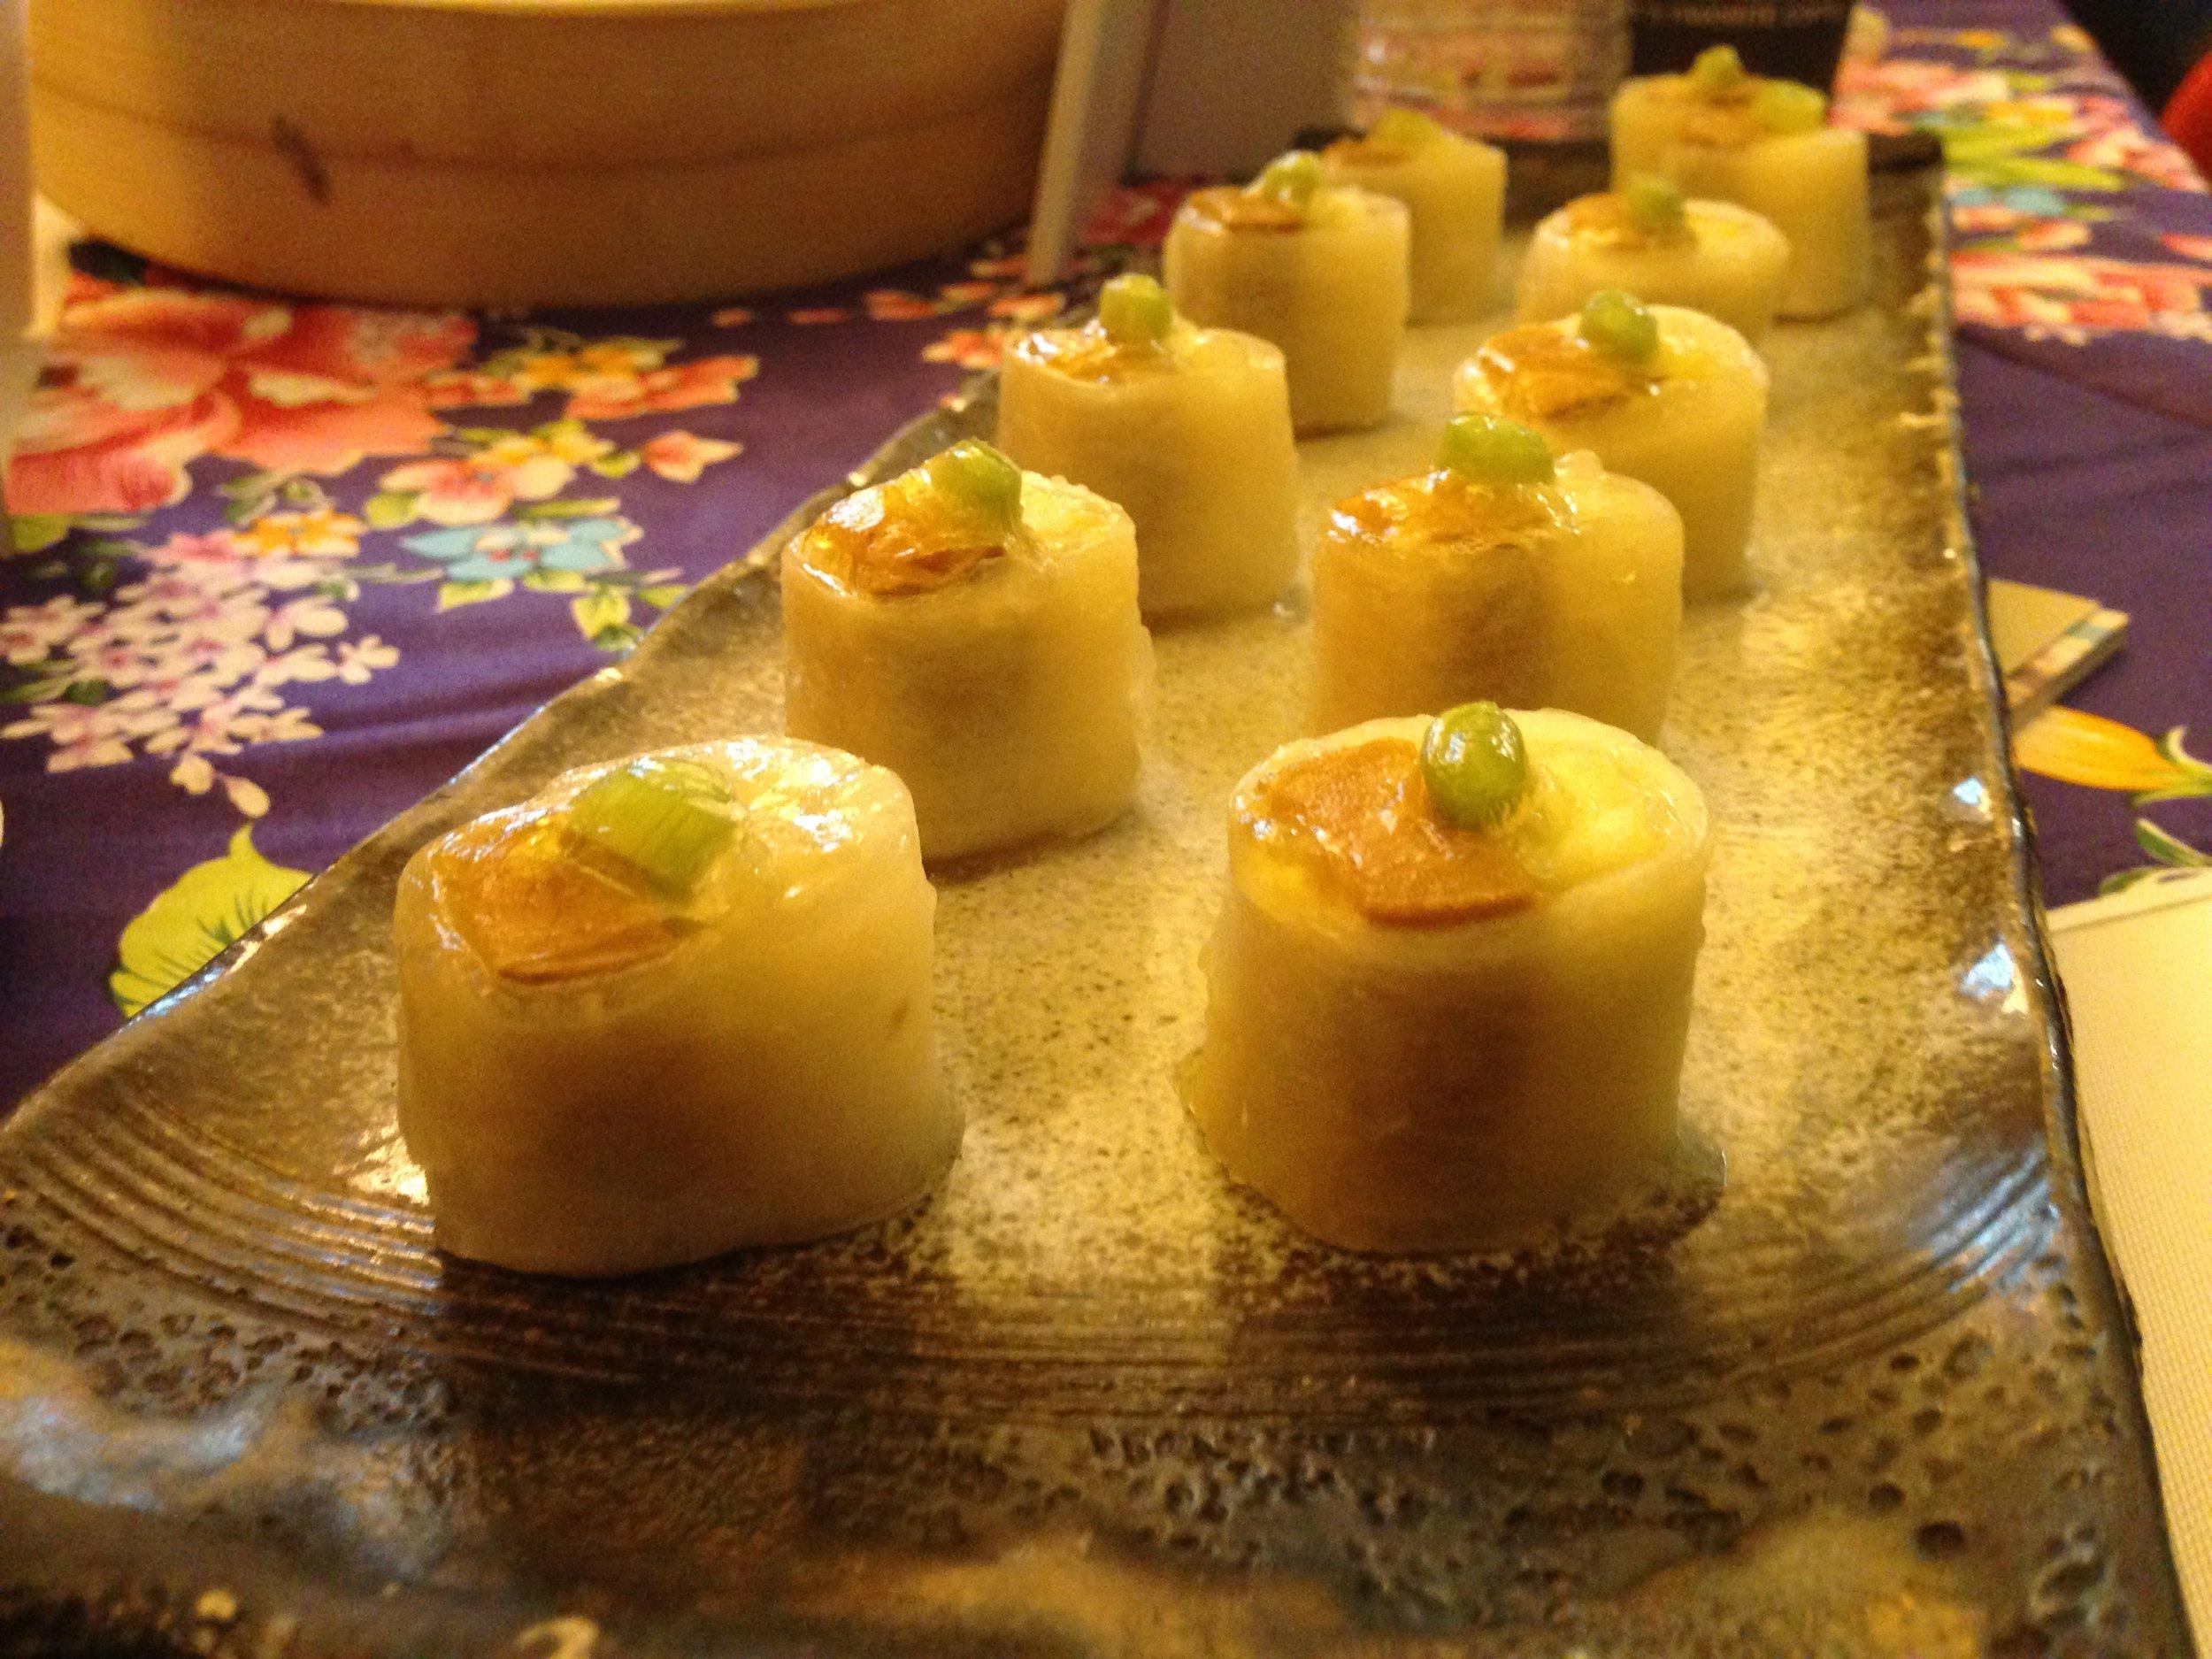 Taiwanese caviar mullet (mullet fish, turnip, and leek) samples from  Taiwan Shin Yeh International Group .